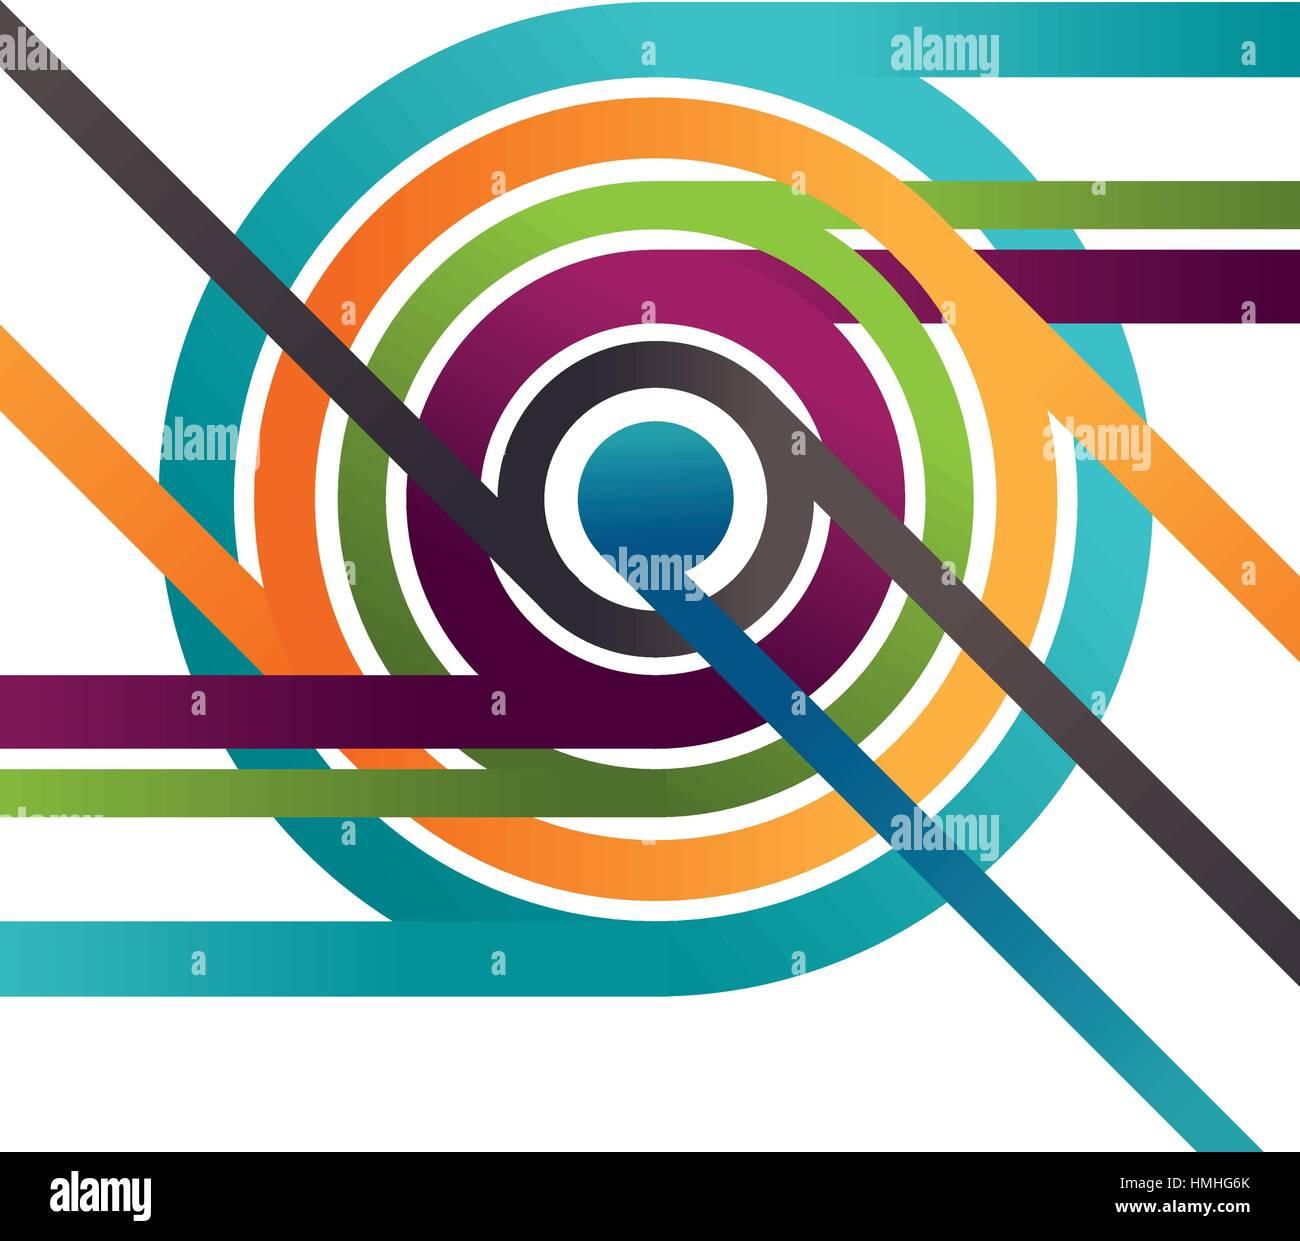 Background of varied colors vector illustration design - Stock Image